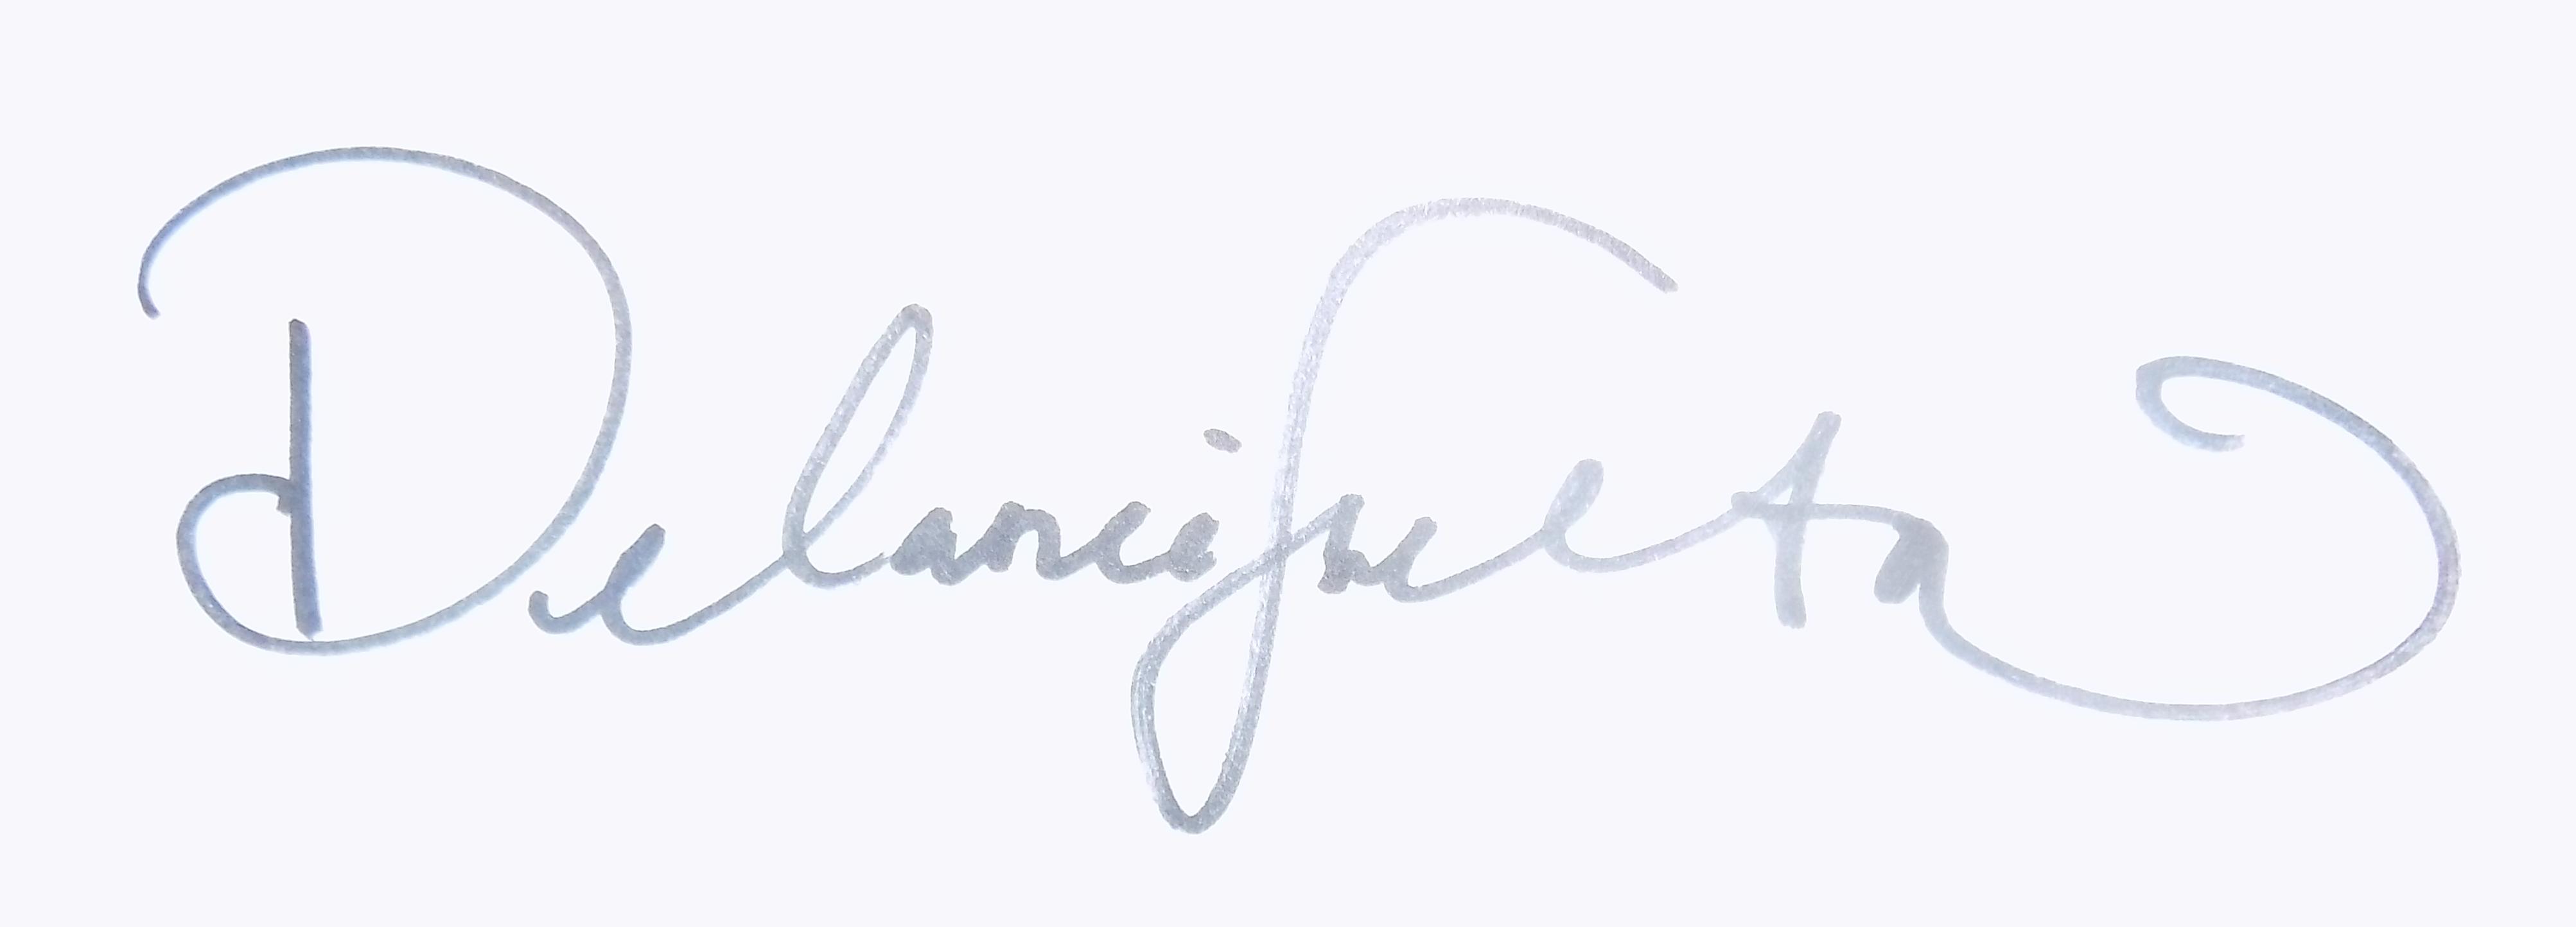 Delanie Shelton's Signature